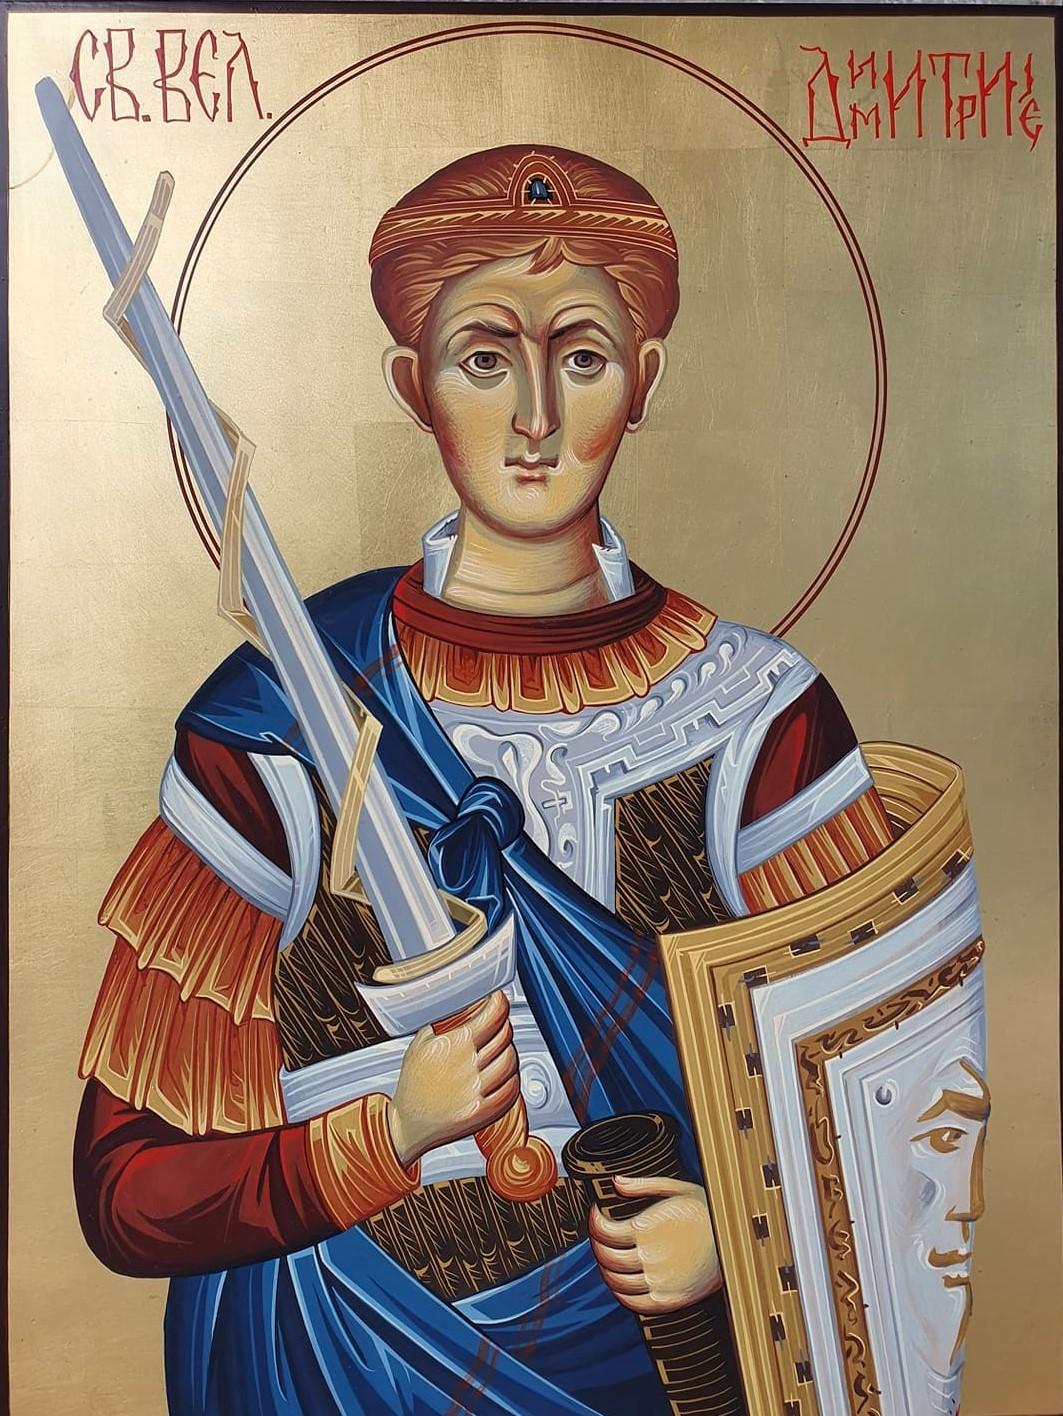 Sveti Dimitrije, ikona, 40×30 cm, jajcana tempera na medijapanu sa pozlatom, vizantijski stil po pravoslavnim kanonima, ikonopisac Nikola Timotijevic, sertifikat, 190 eura